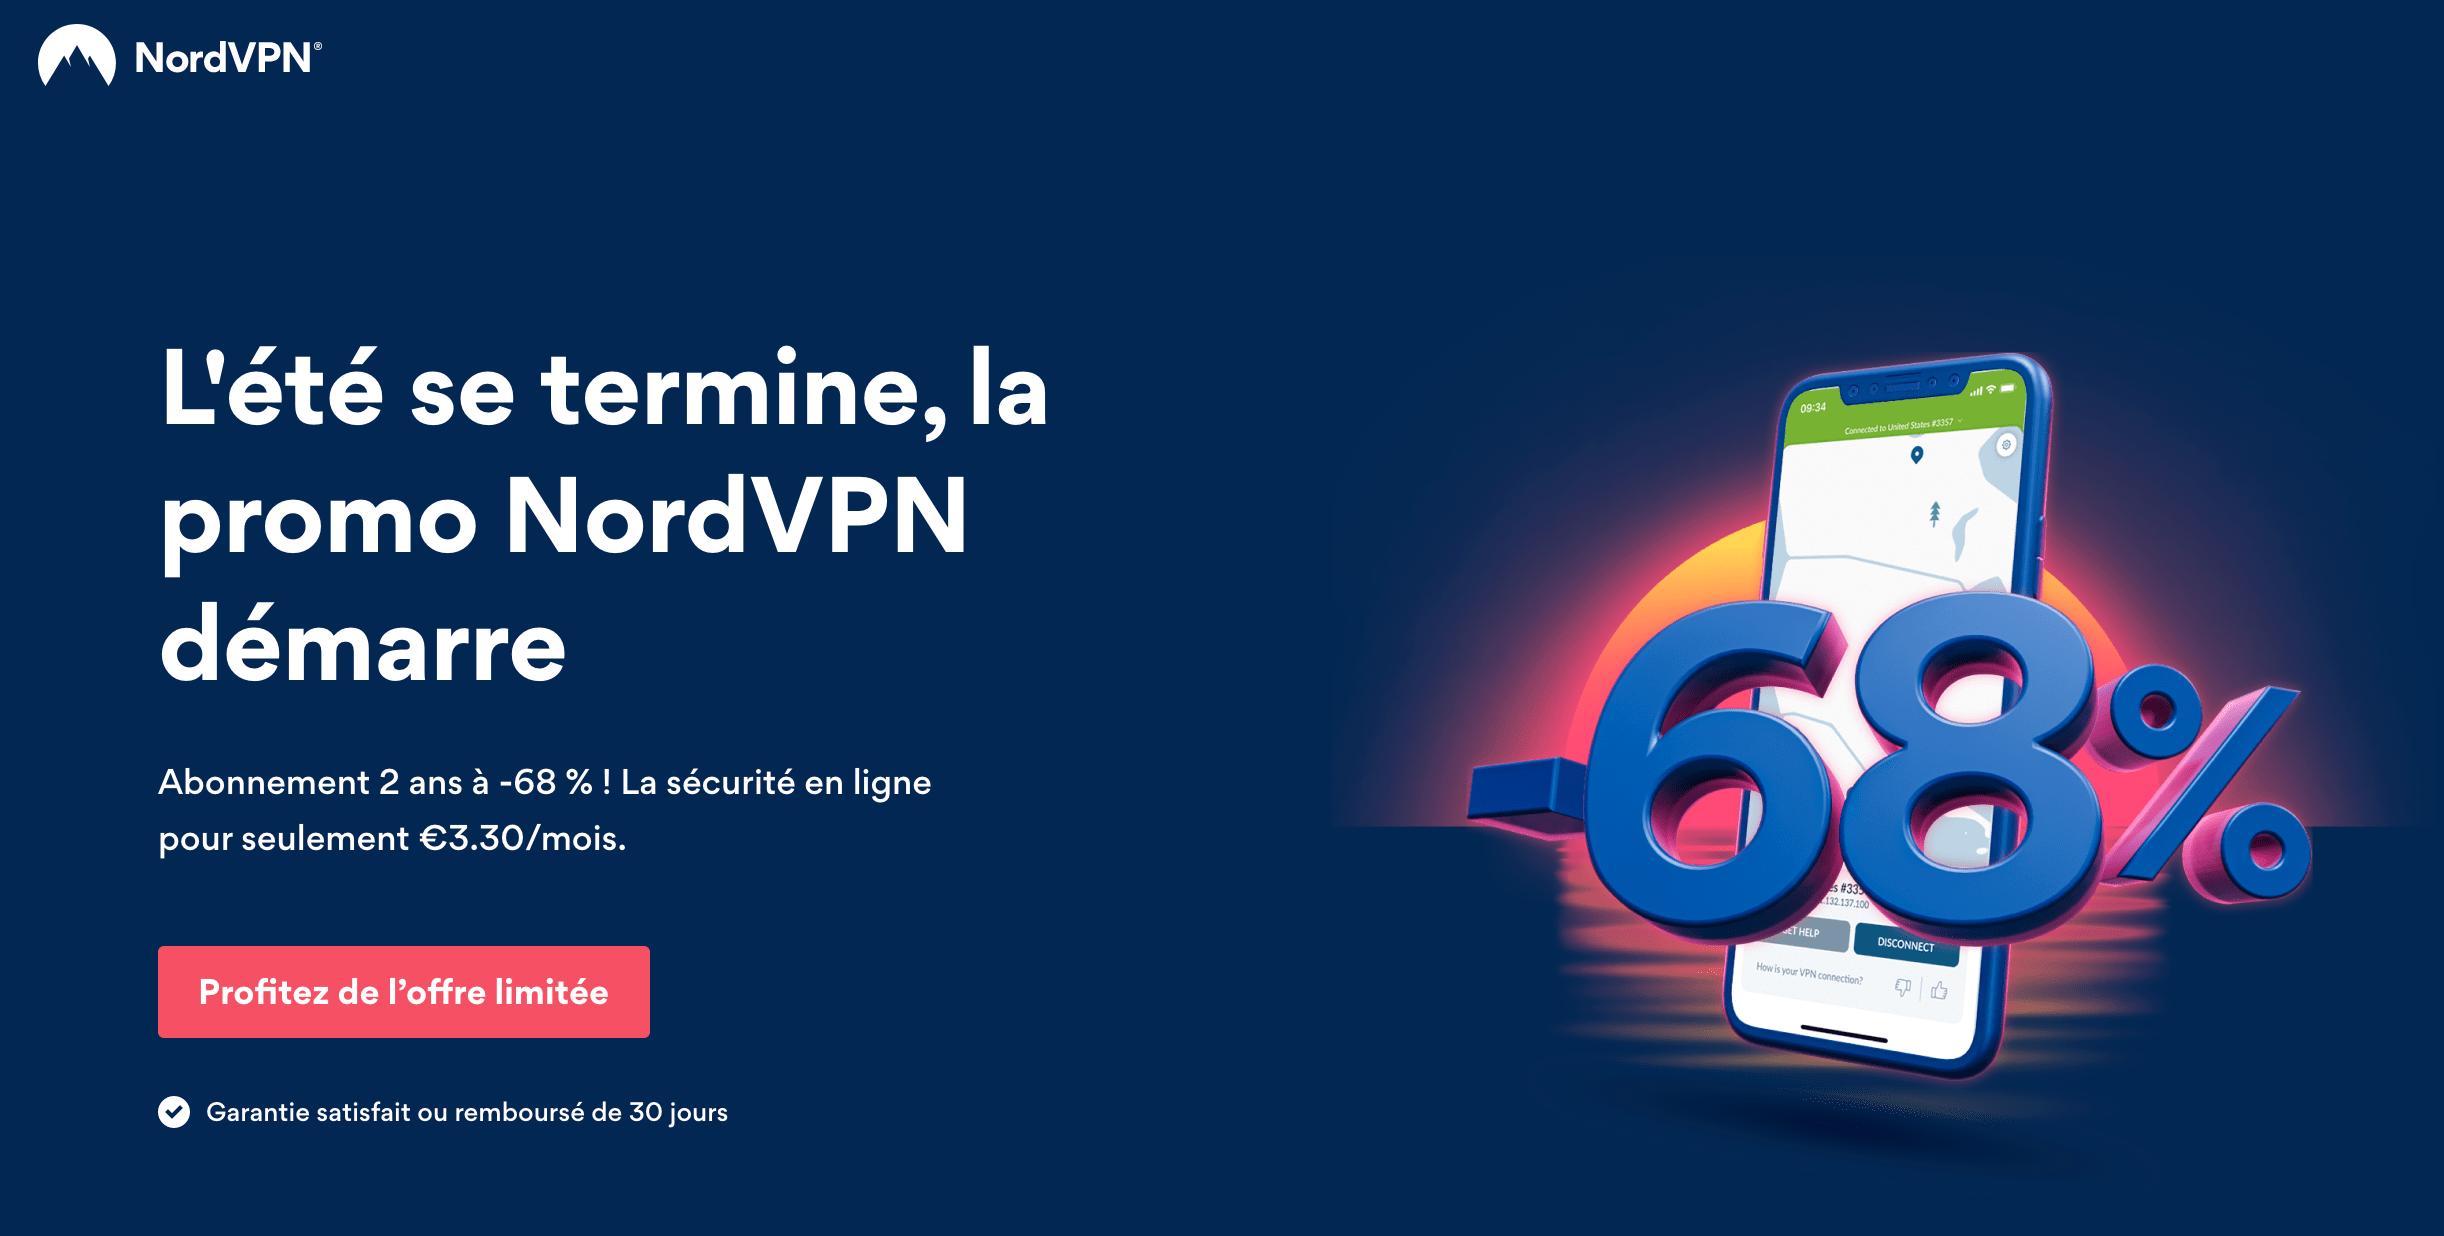 Promo NordVPN: 68% de réduction grâce au code decrypte